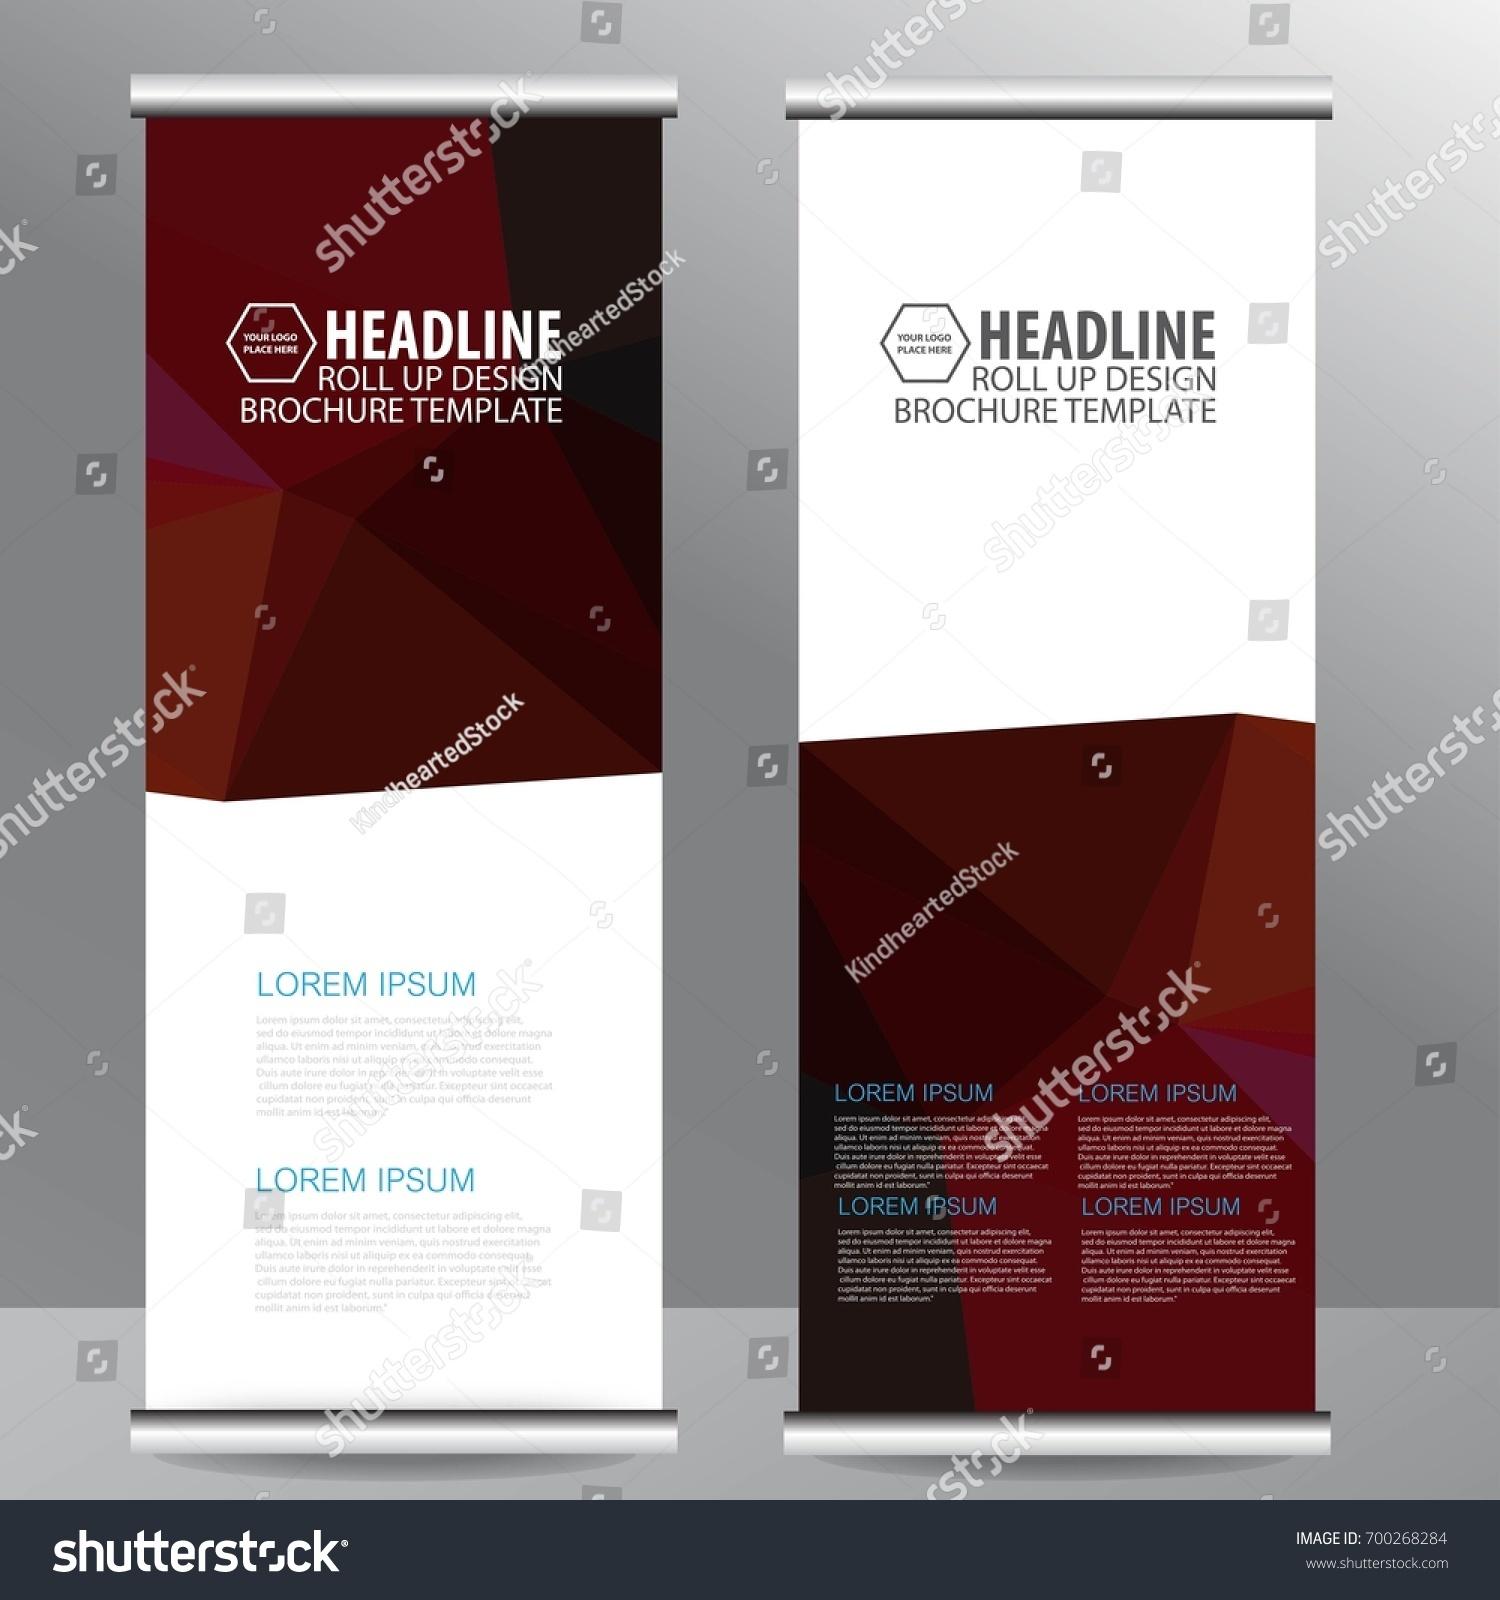 roll up business brochure flyer banner design vertical template